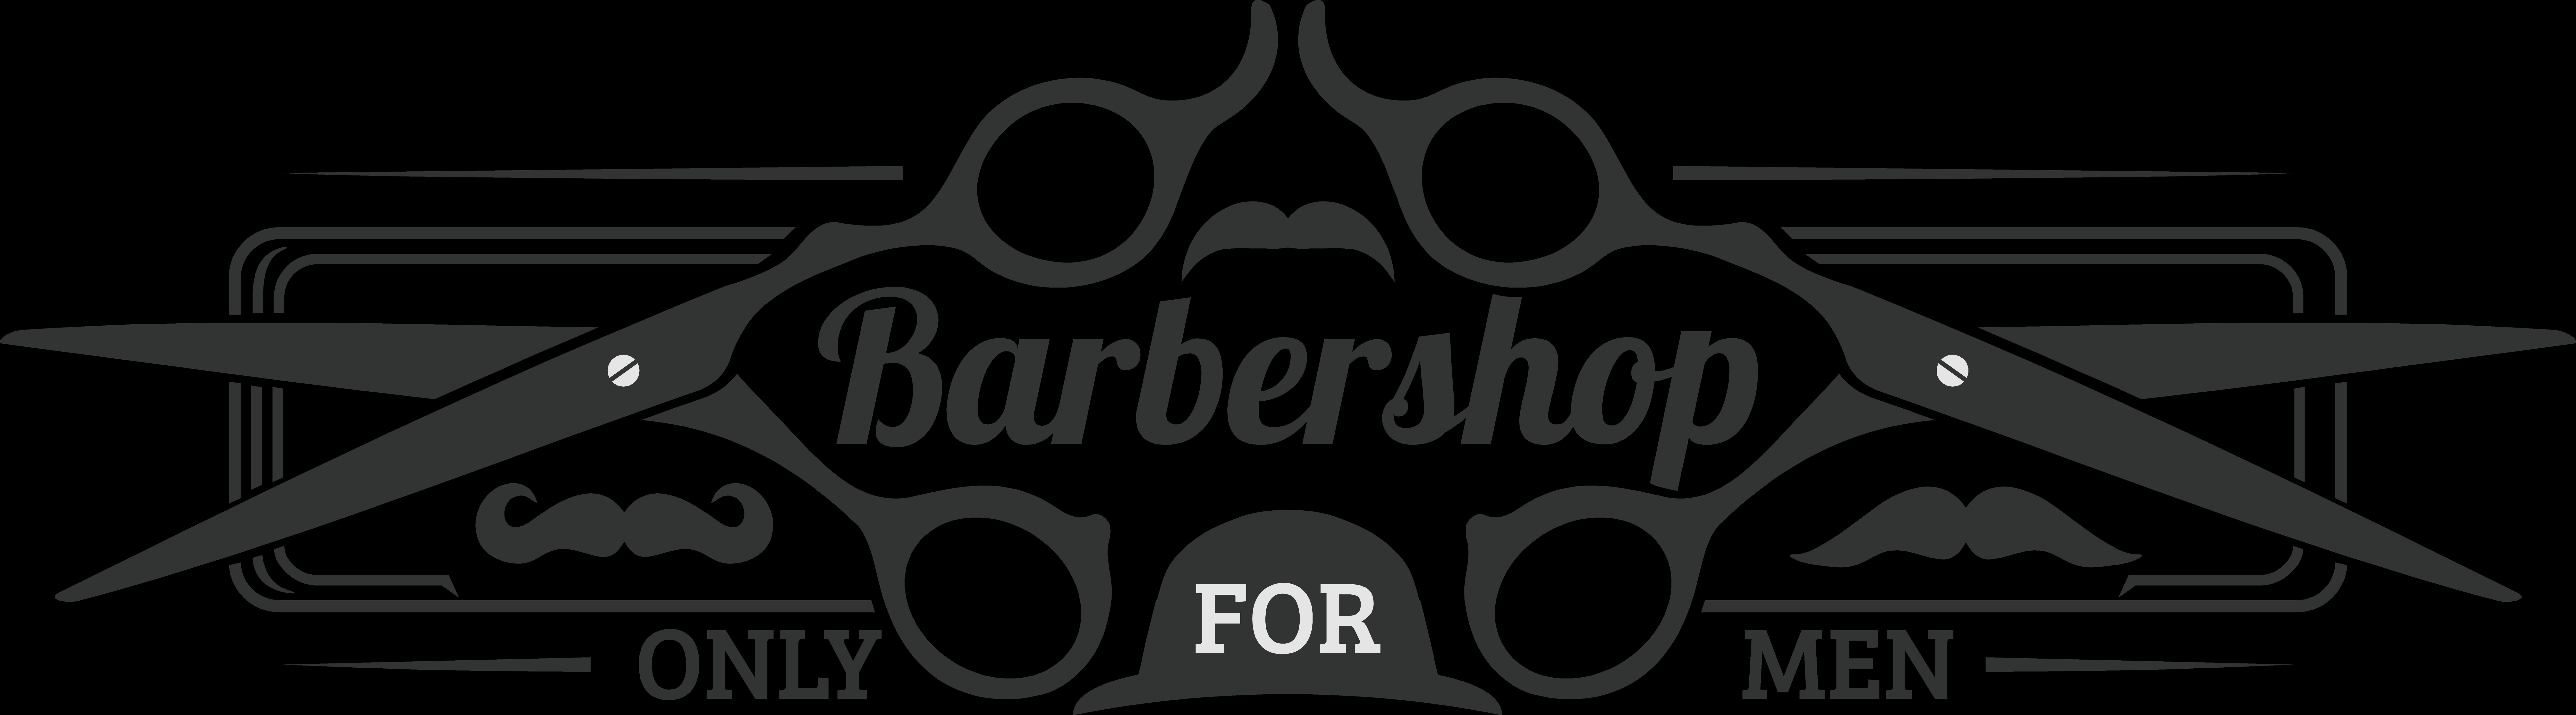 Barber shop logo vector clipart picture black and white download Barber shop logo vector clipart images gallery for free download ... picture black and white download